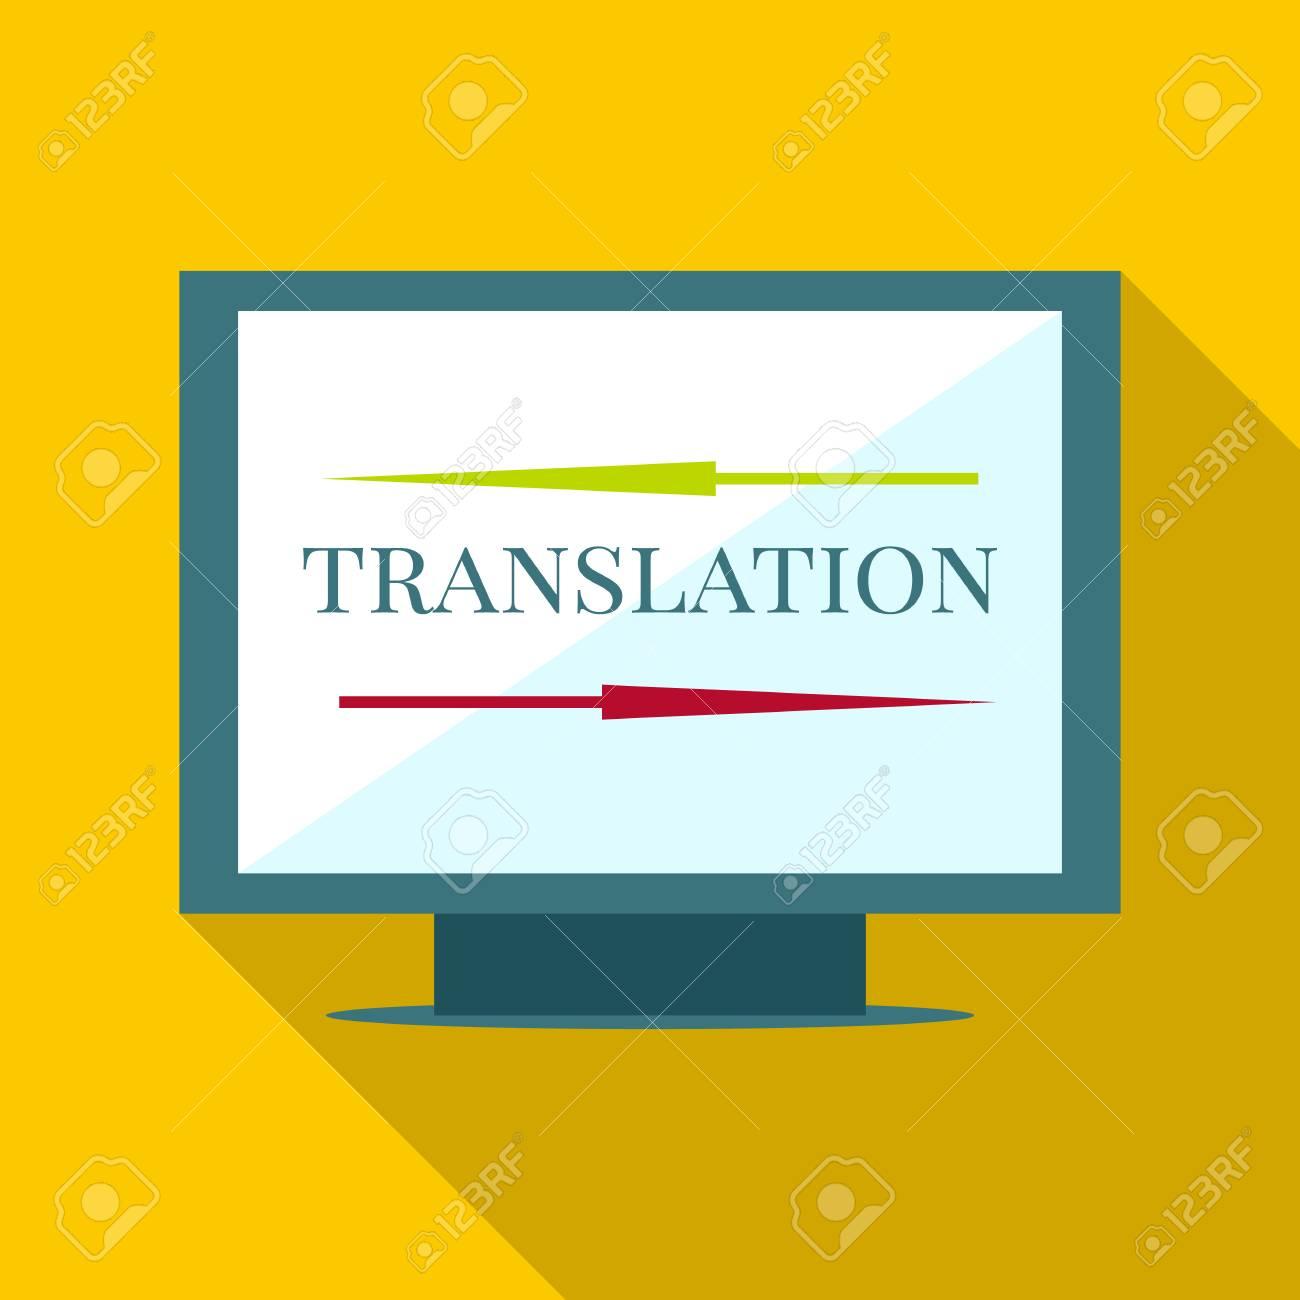 computer translation icon flat illustration of computer translation